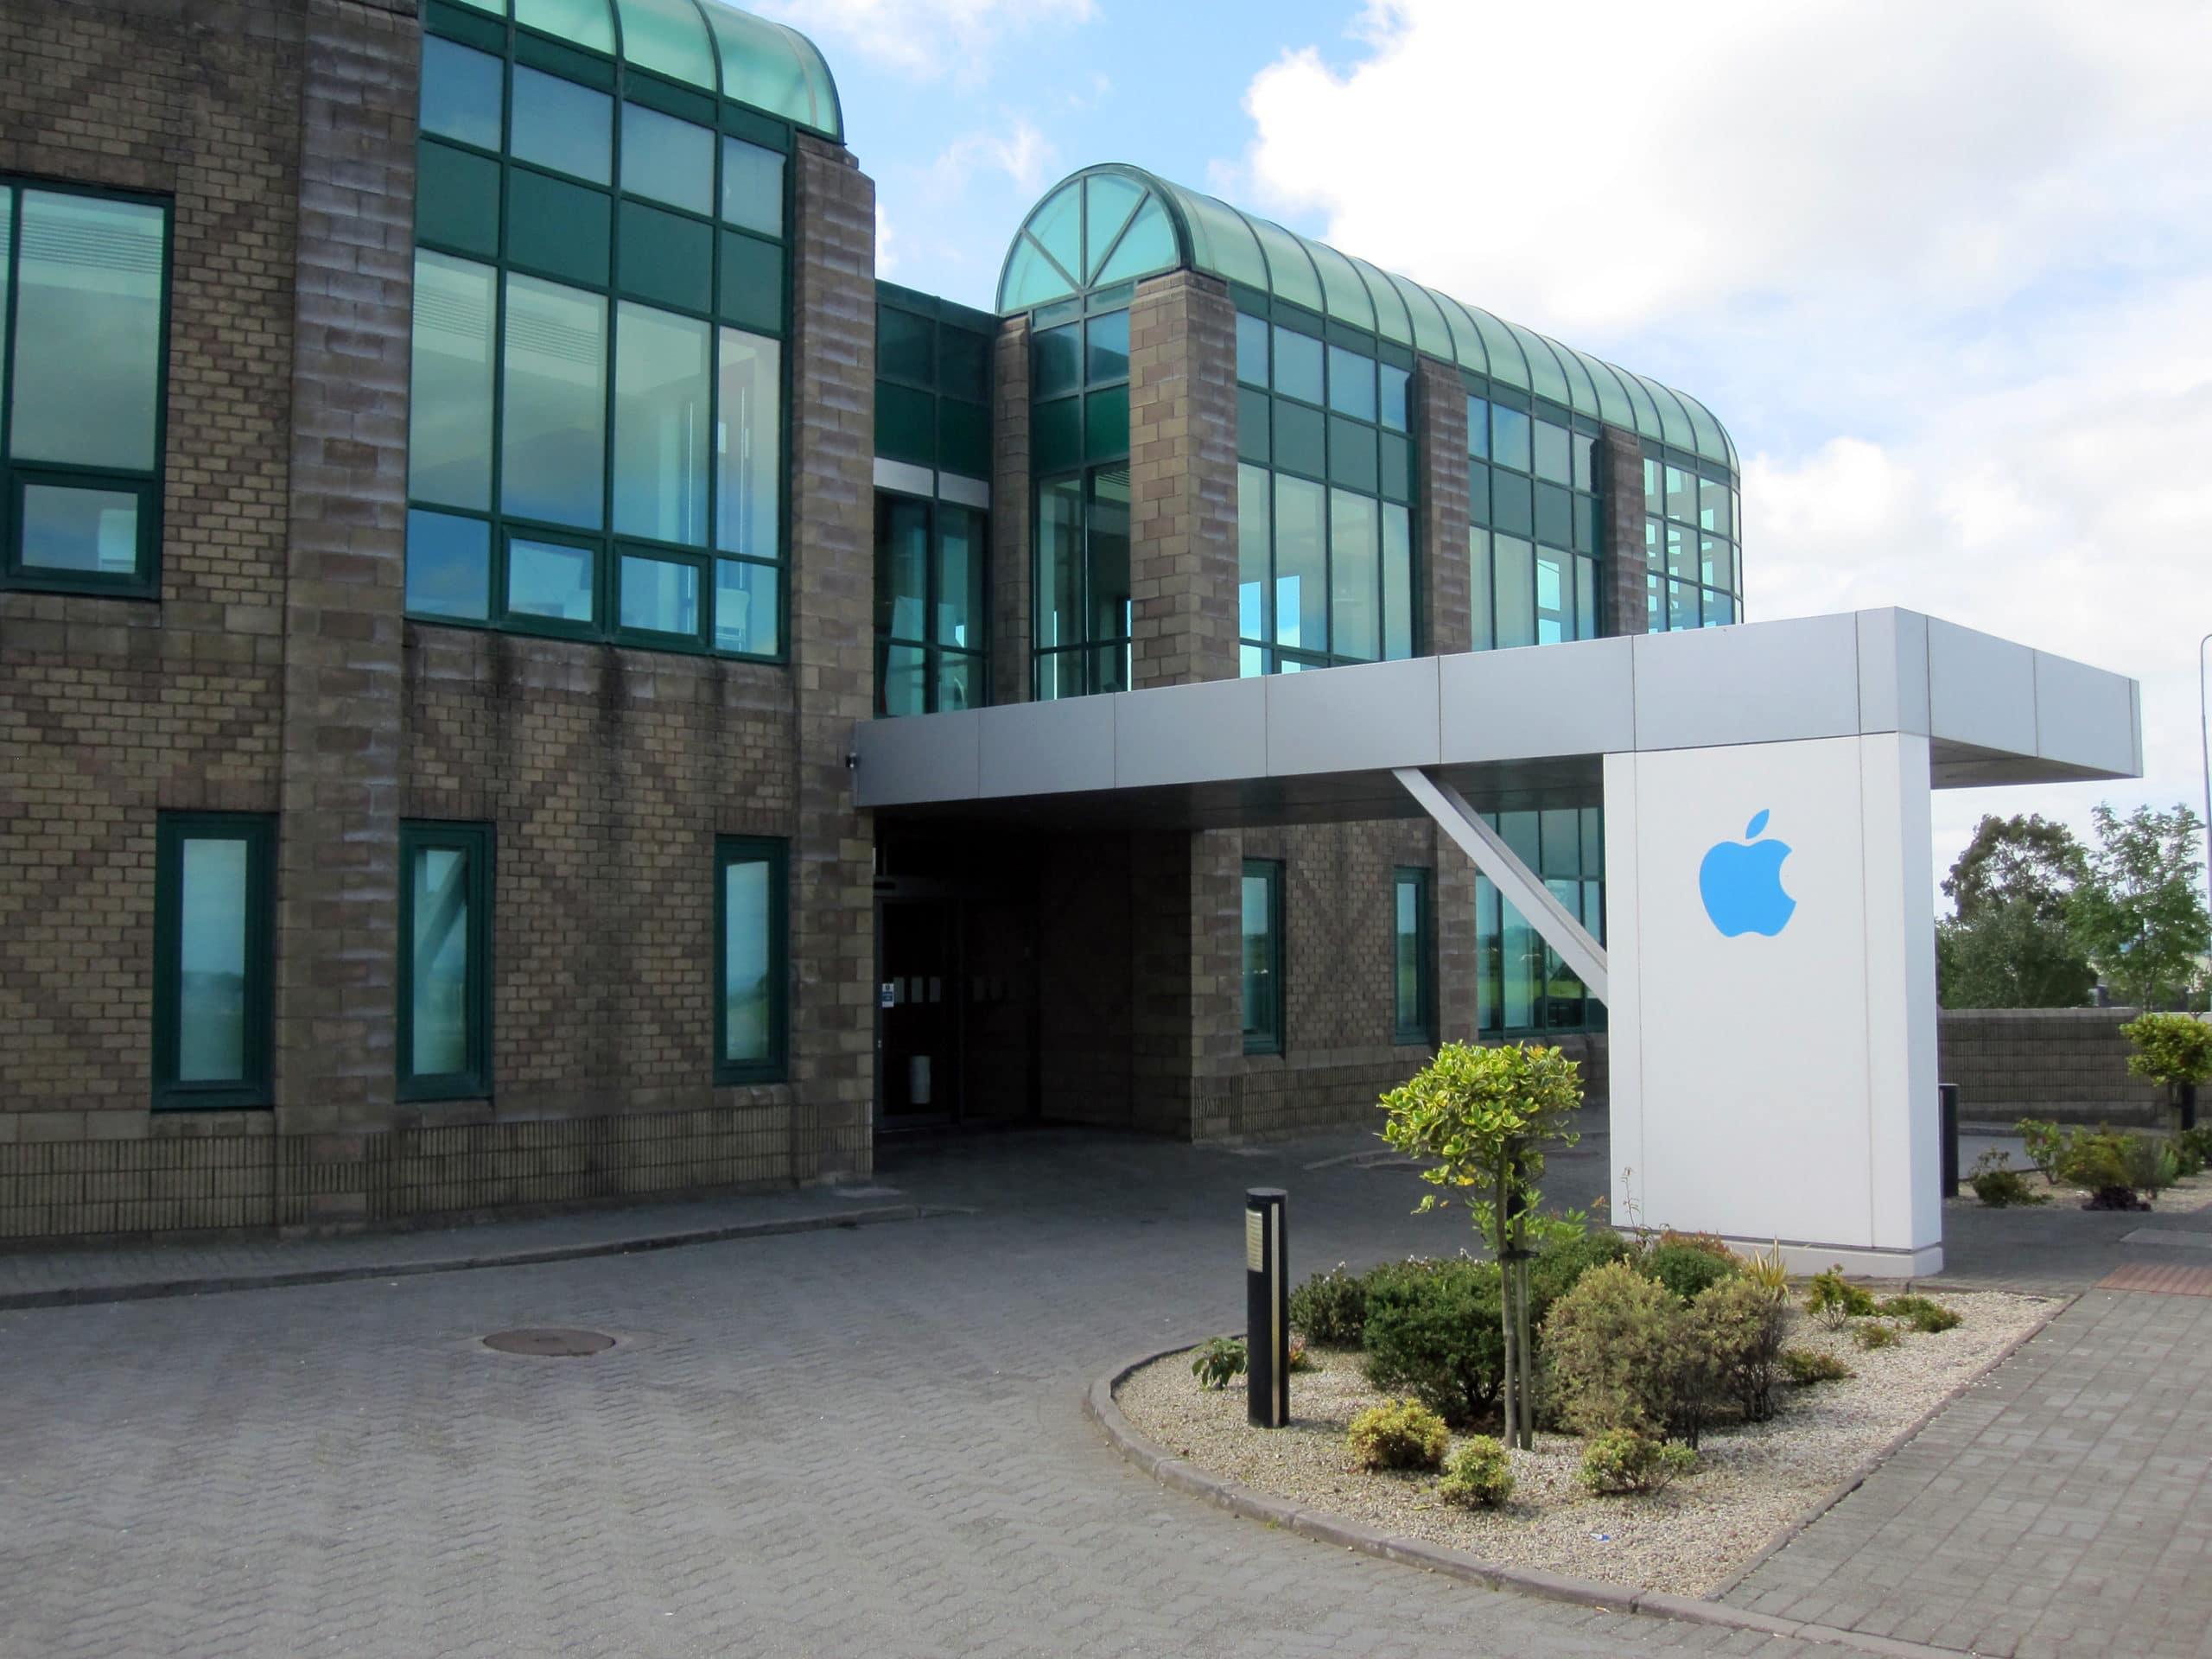 Sede da Apple na Irlanda